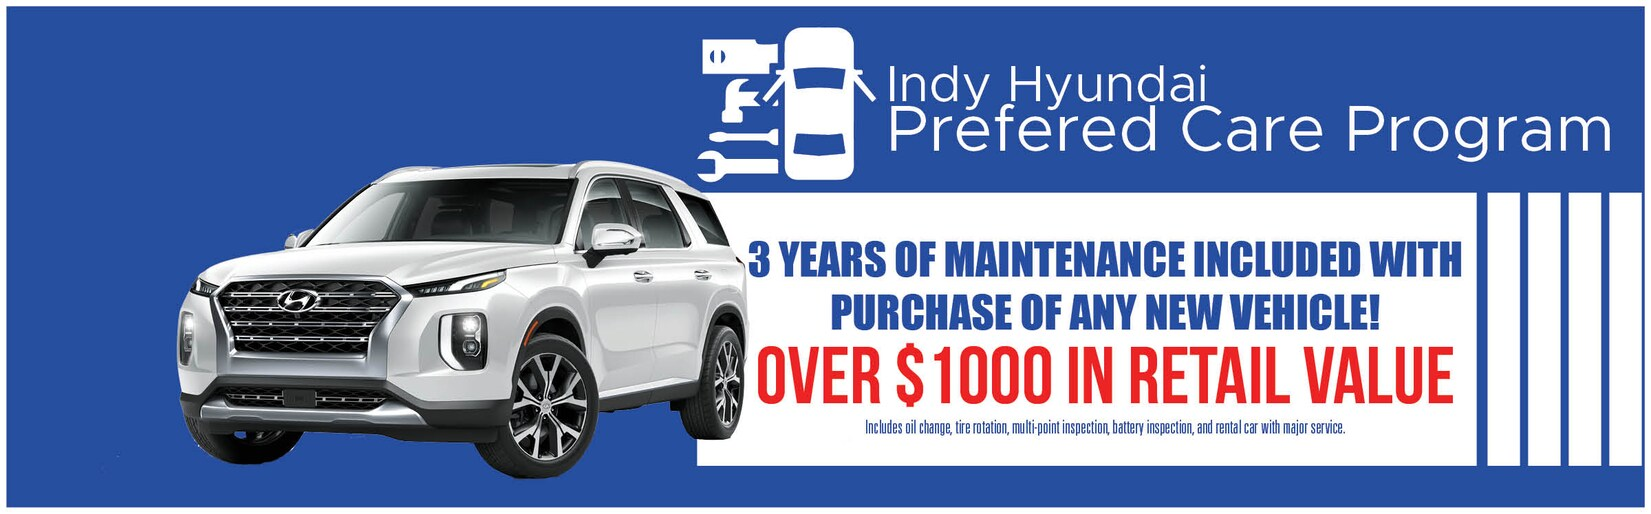 Retail Value Of Car >> Indy Hyundai New Hyundai Dealership In Indianapolis In